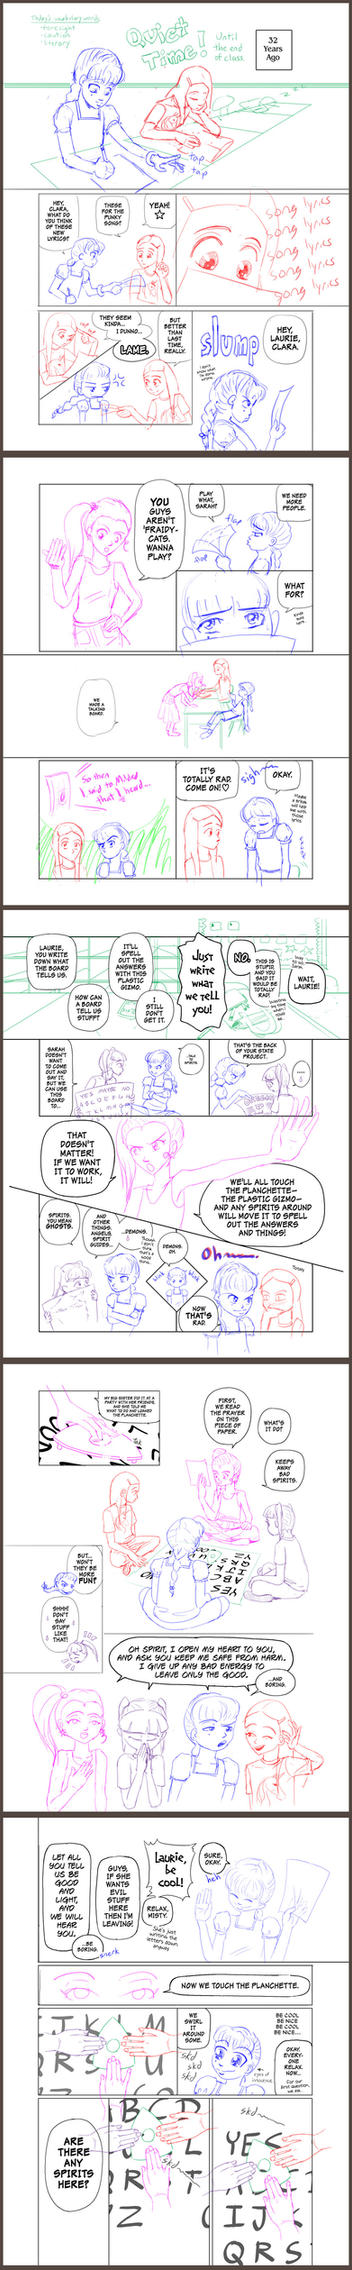 My Original Manga p7-11 by slr2moons